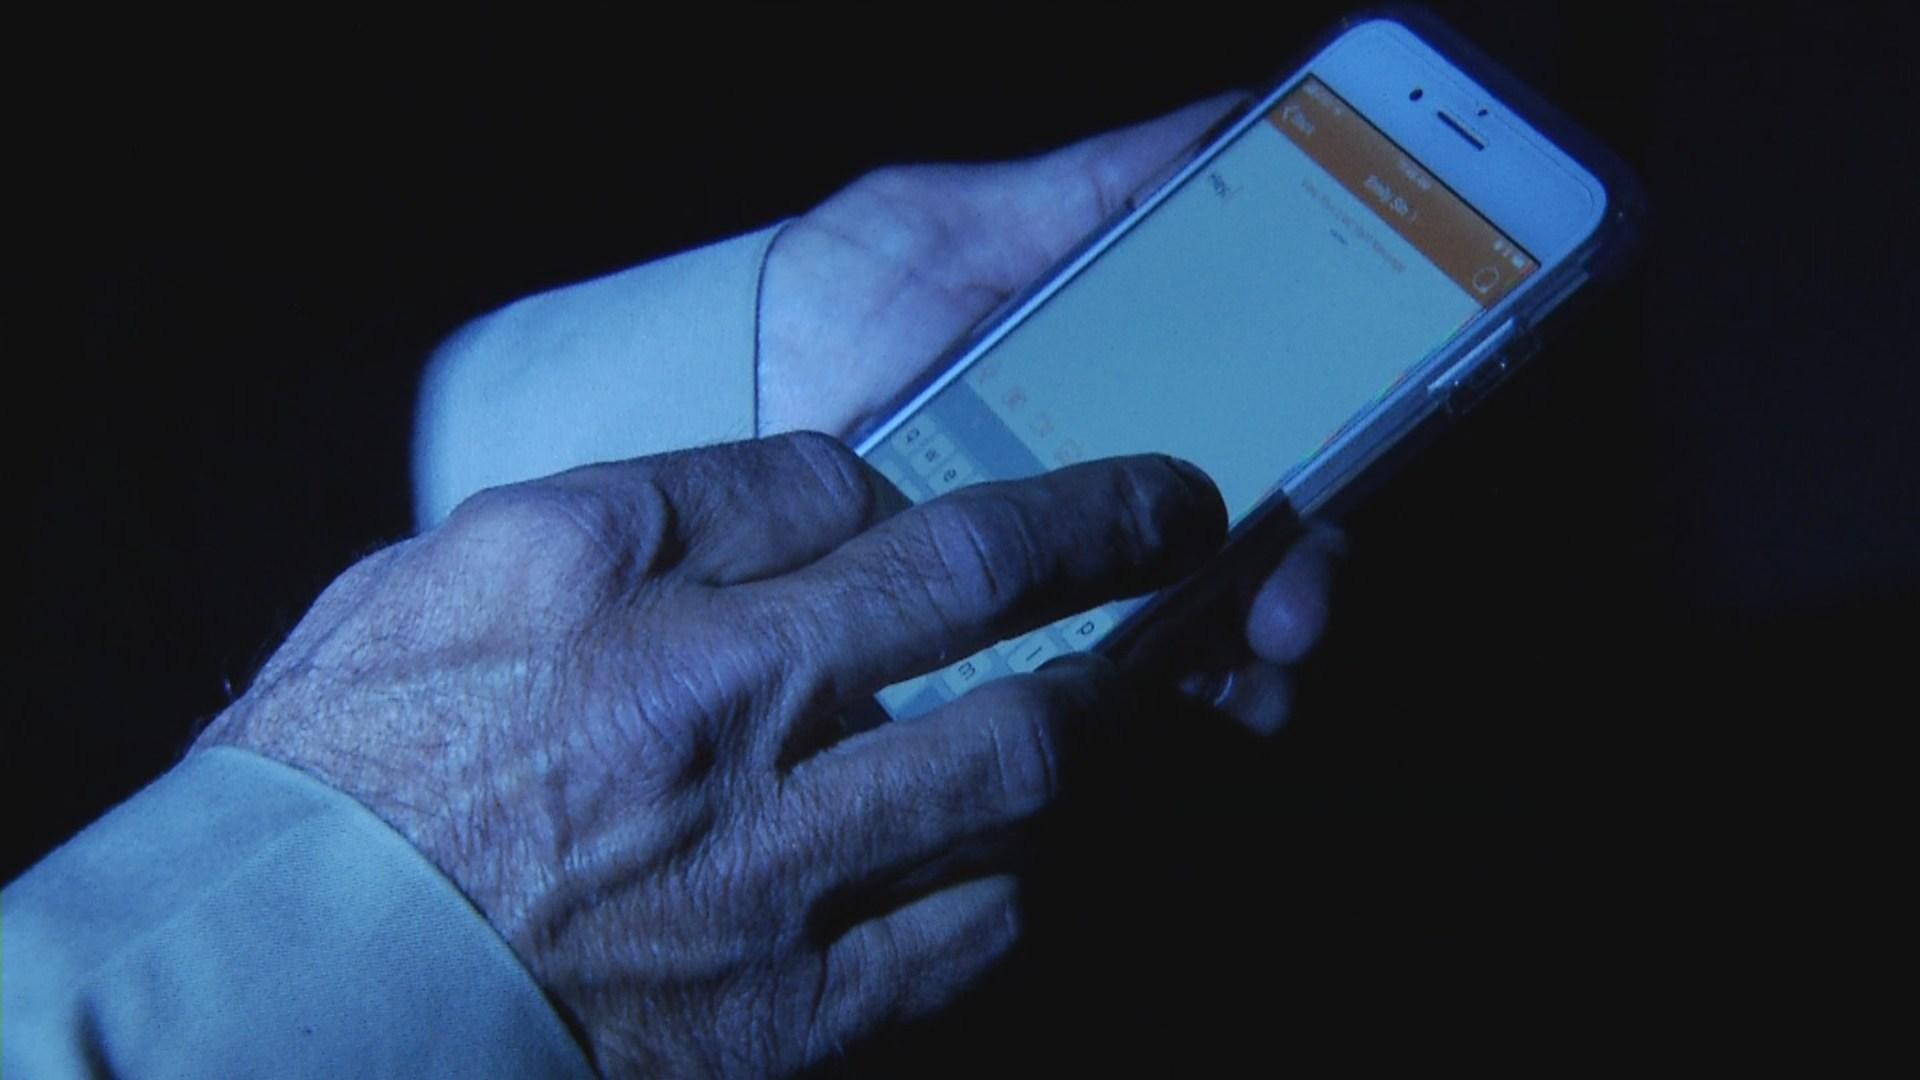 Confide app cracked by Colorado man in spare time